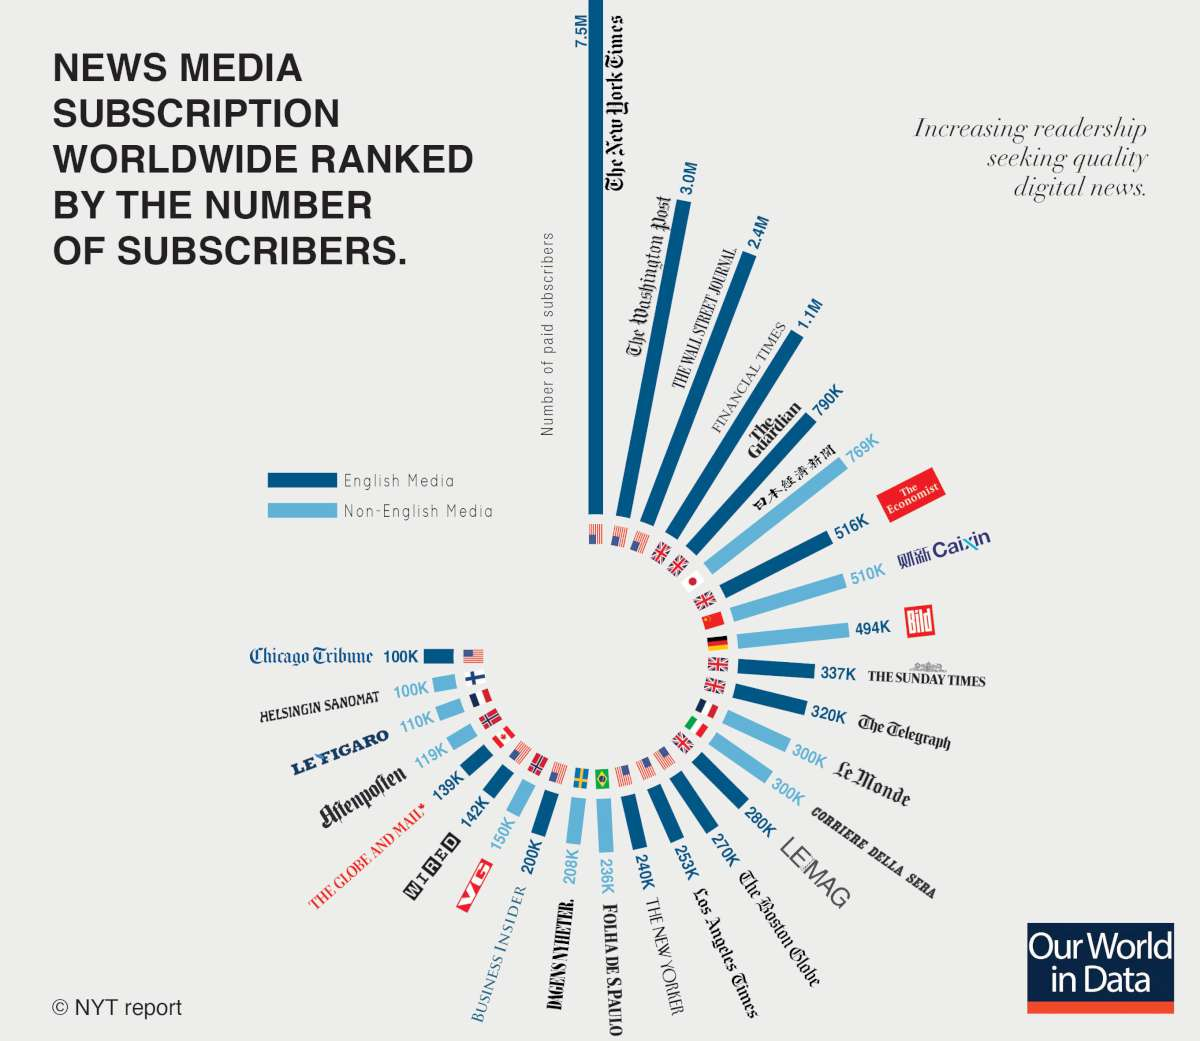 Digital subscribers worldwide